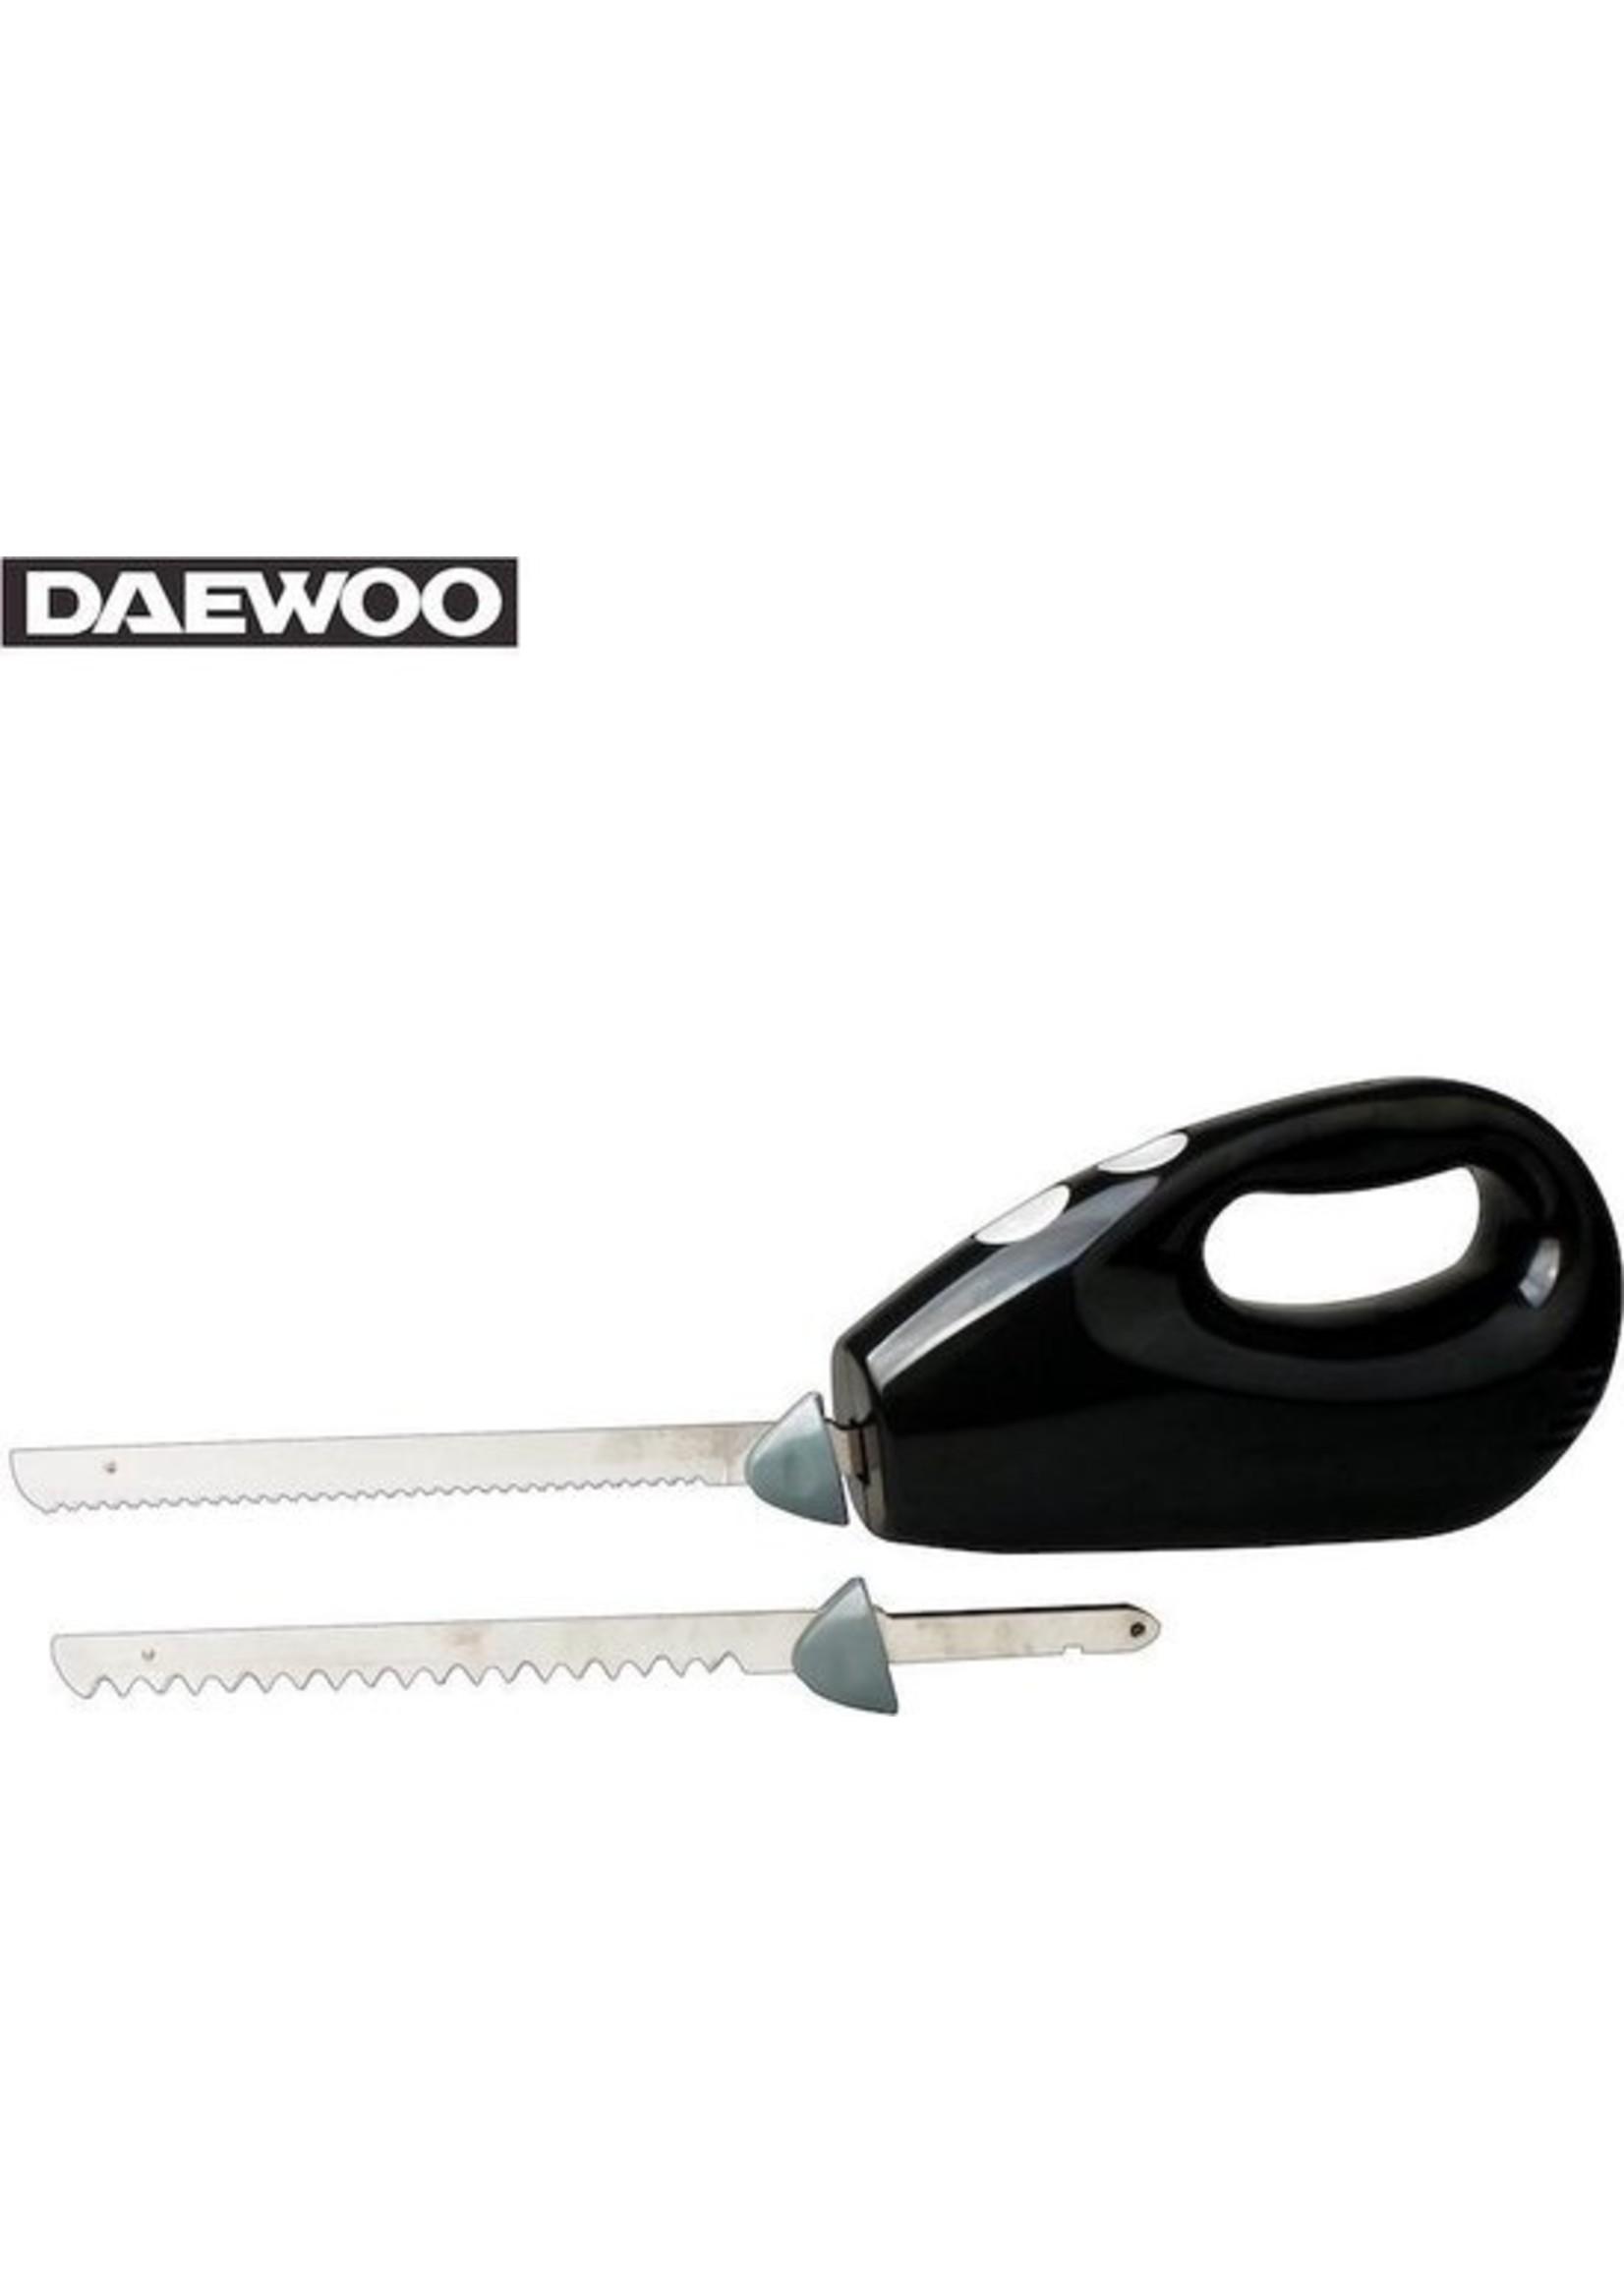 Daewoo Daewoo SYM-1359: Elektrisch mes